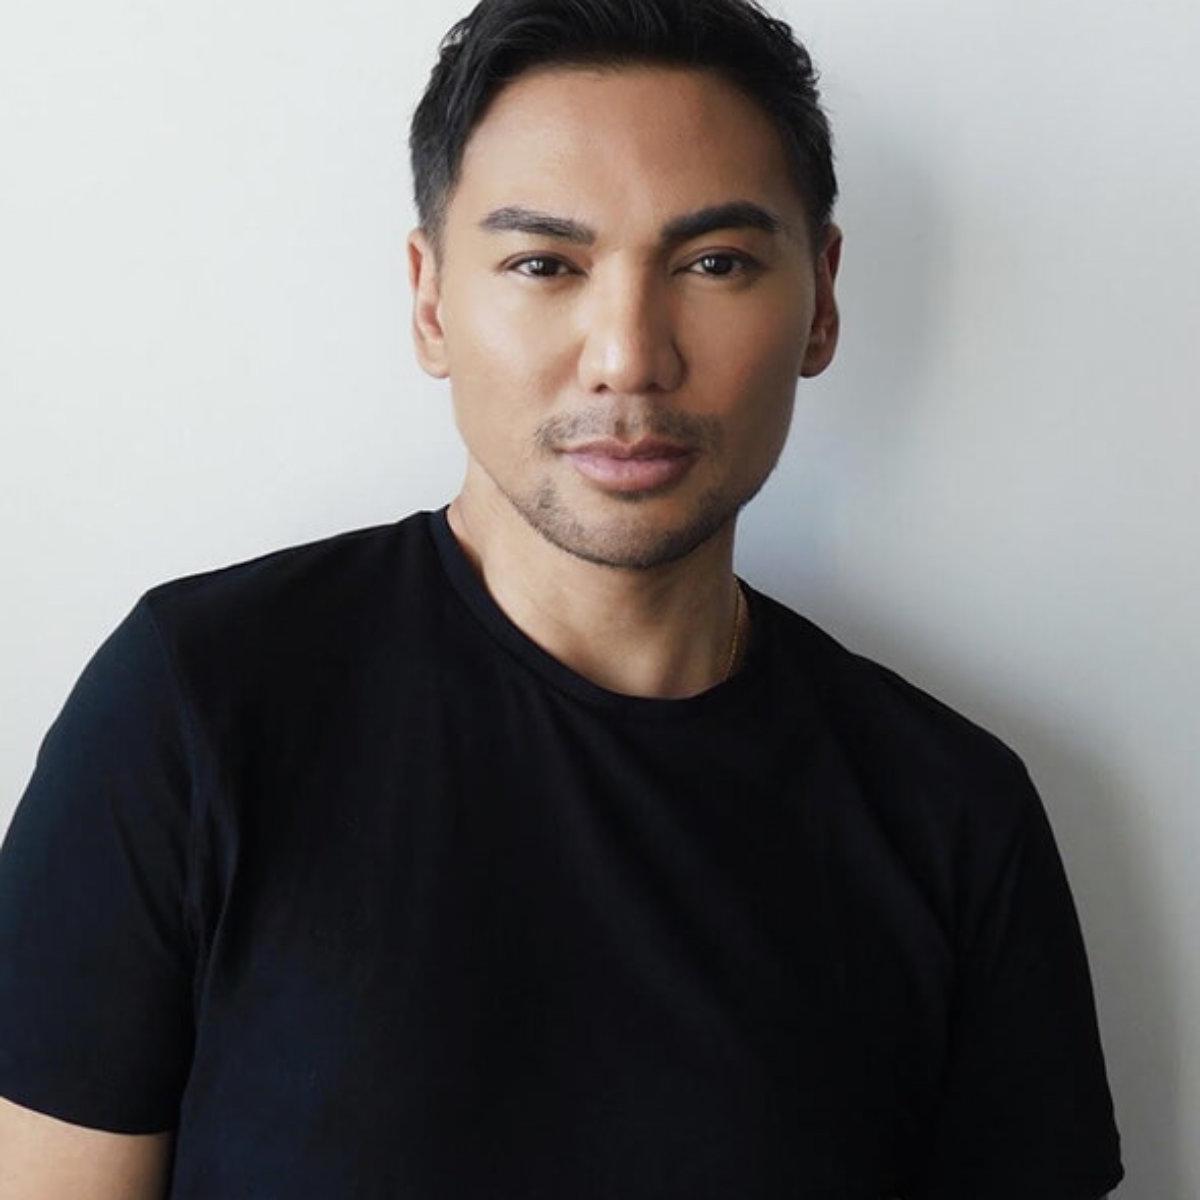 Stylist Ricardo Santiago headshot